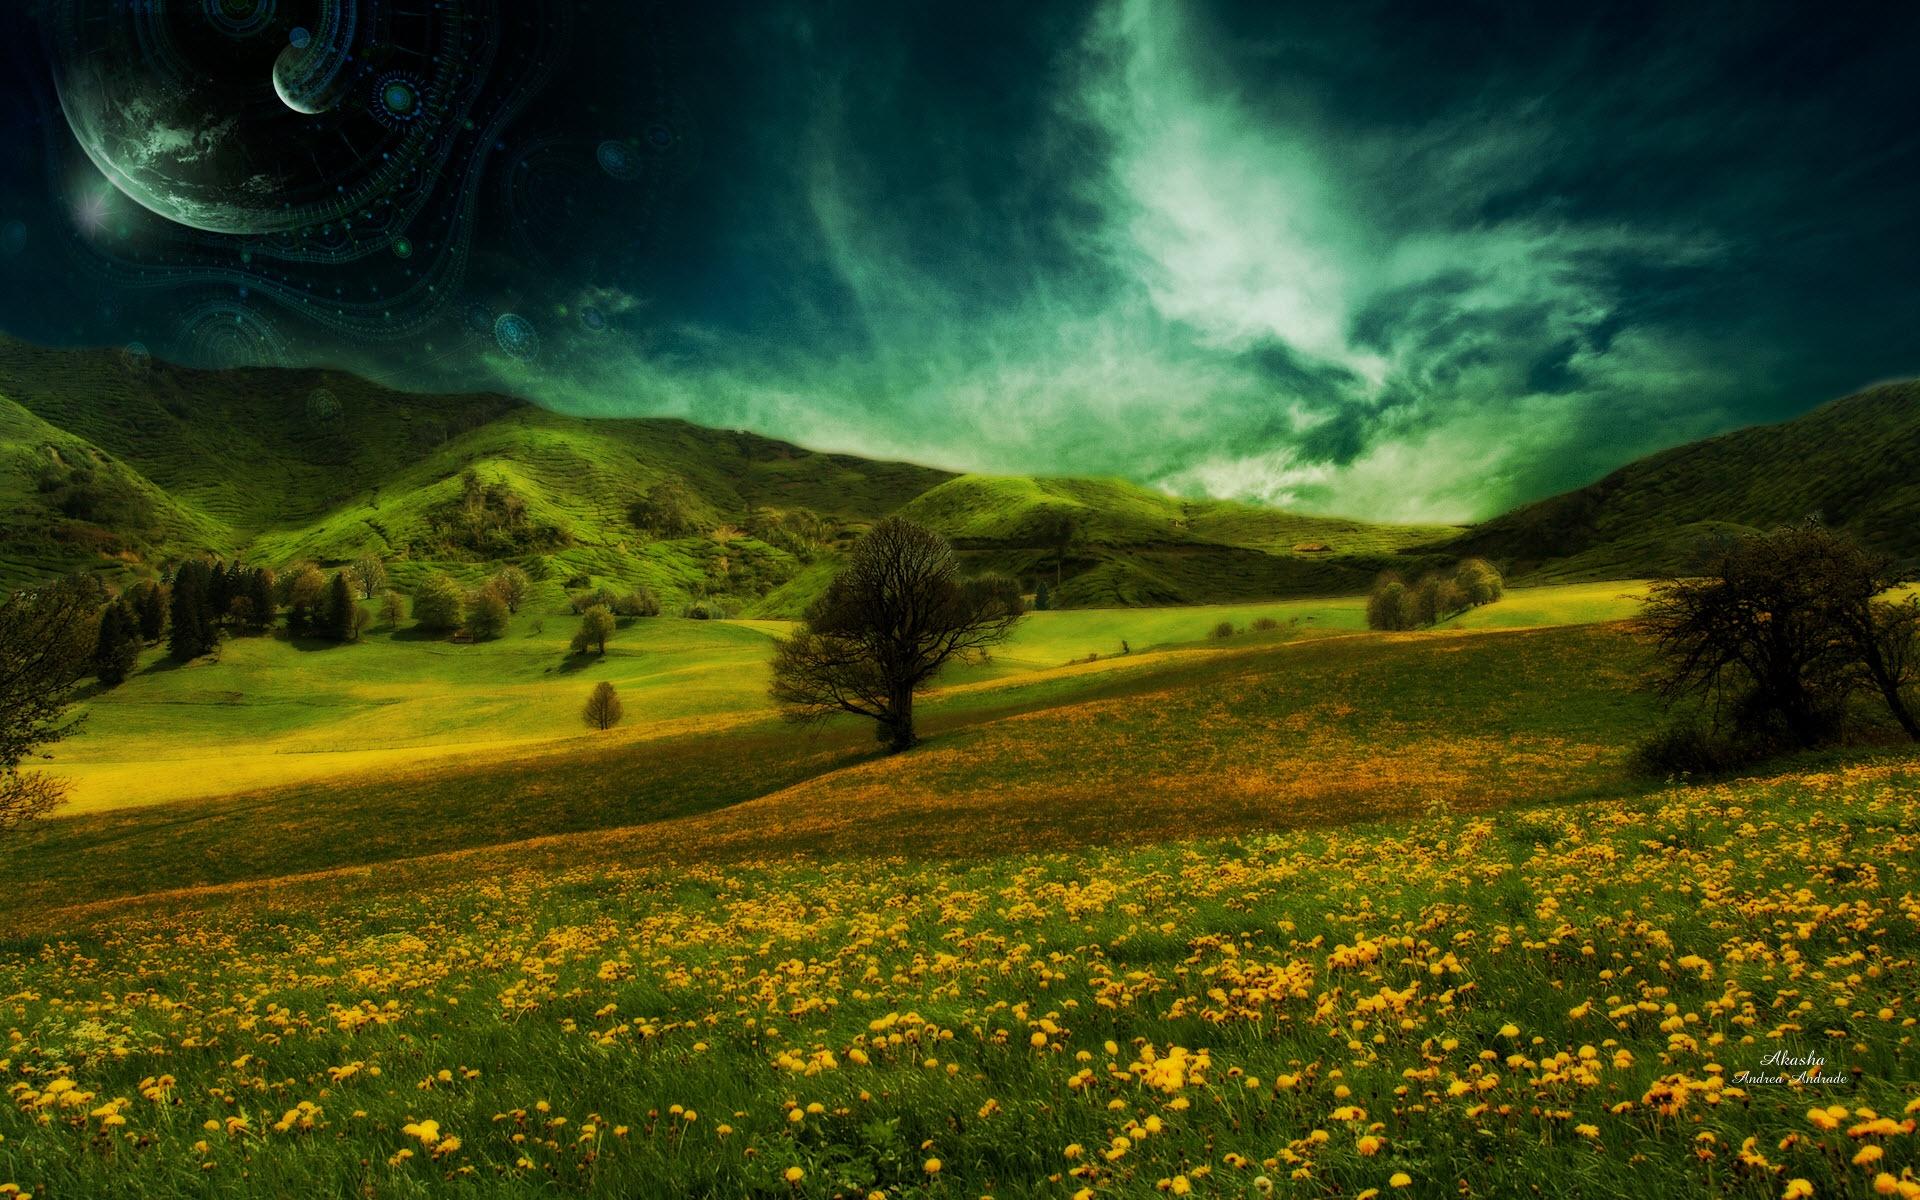 Beautiful Girl Hd Wallpapers 1080p Download Mountain Flower Landscape Full Hd Desktop Wallpapers 1080p